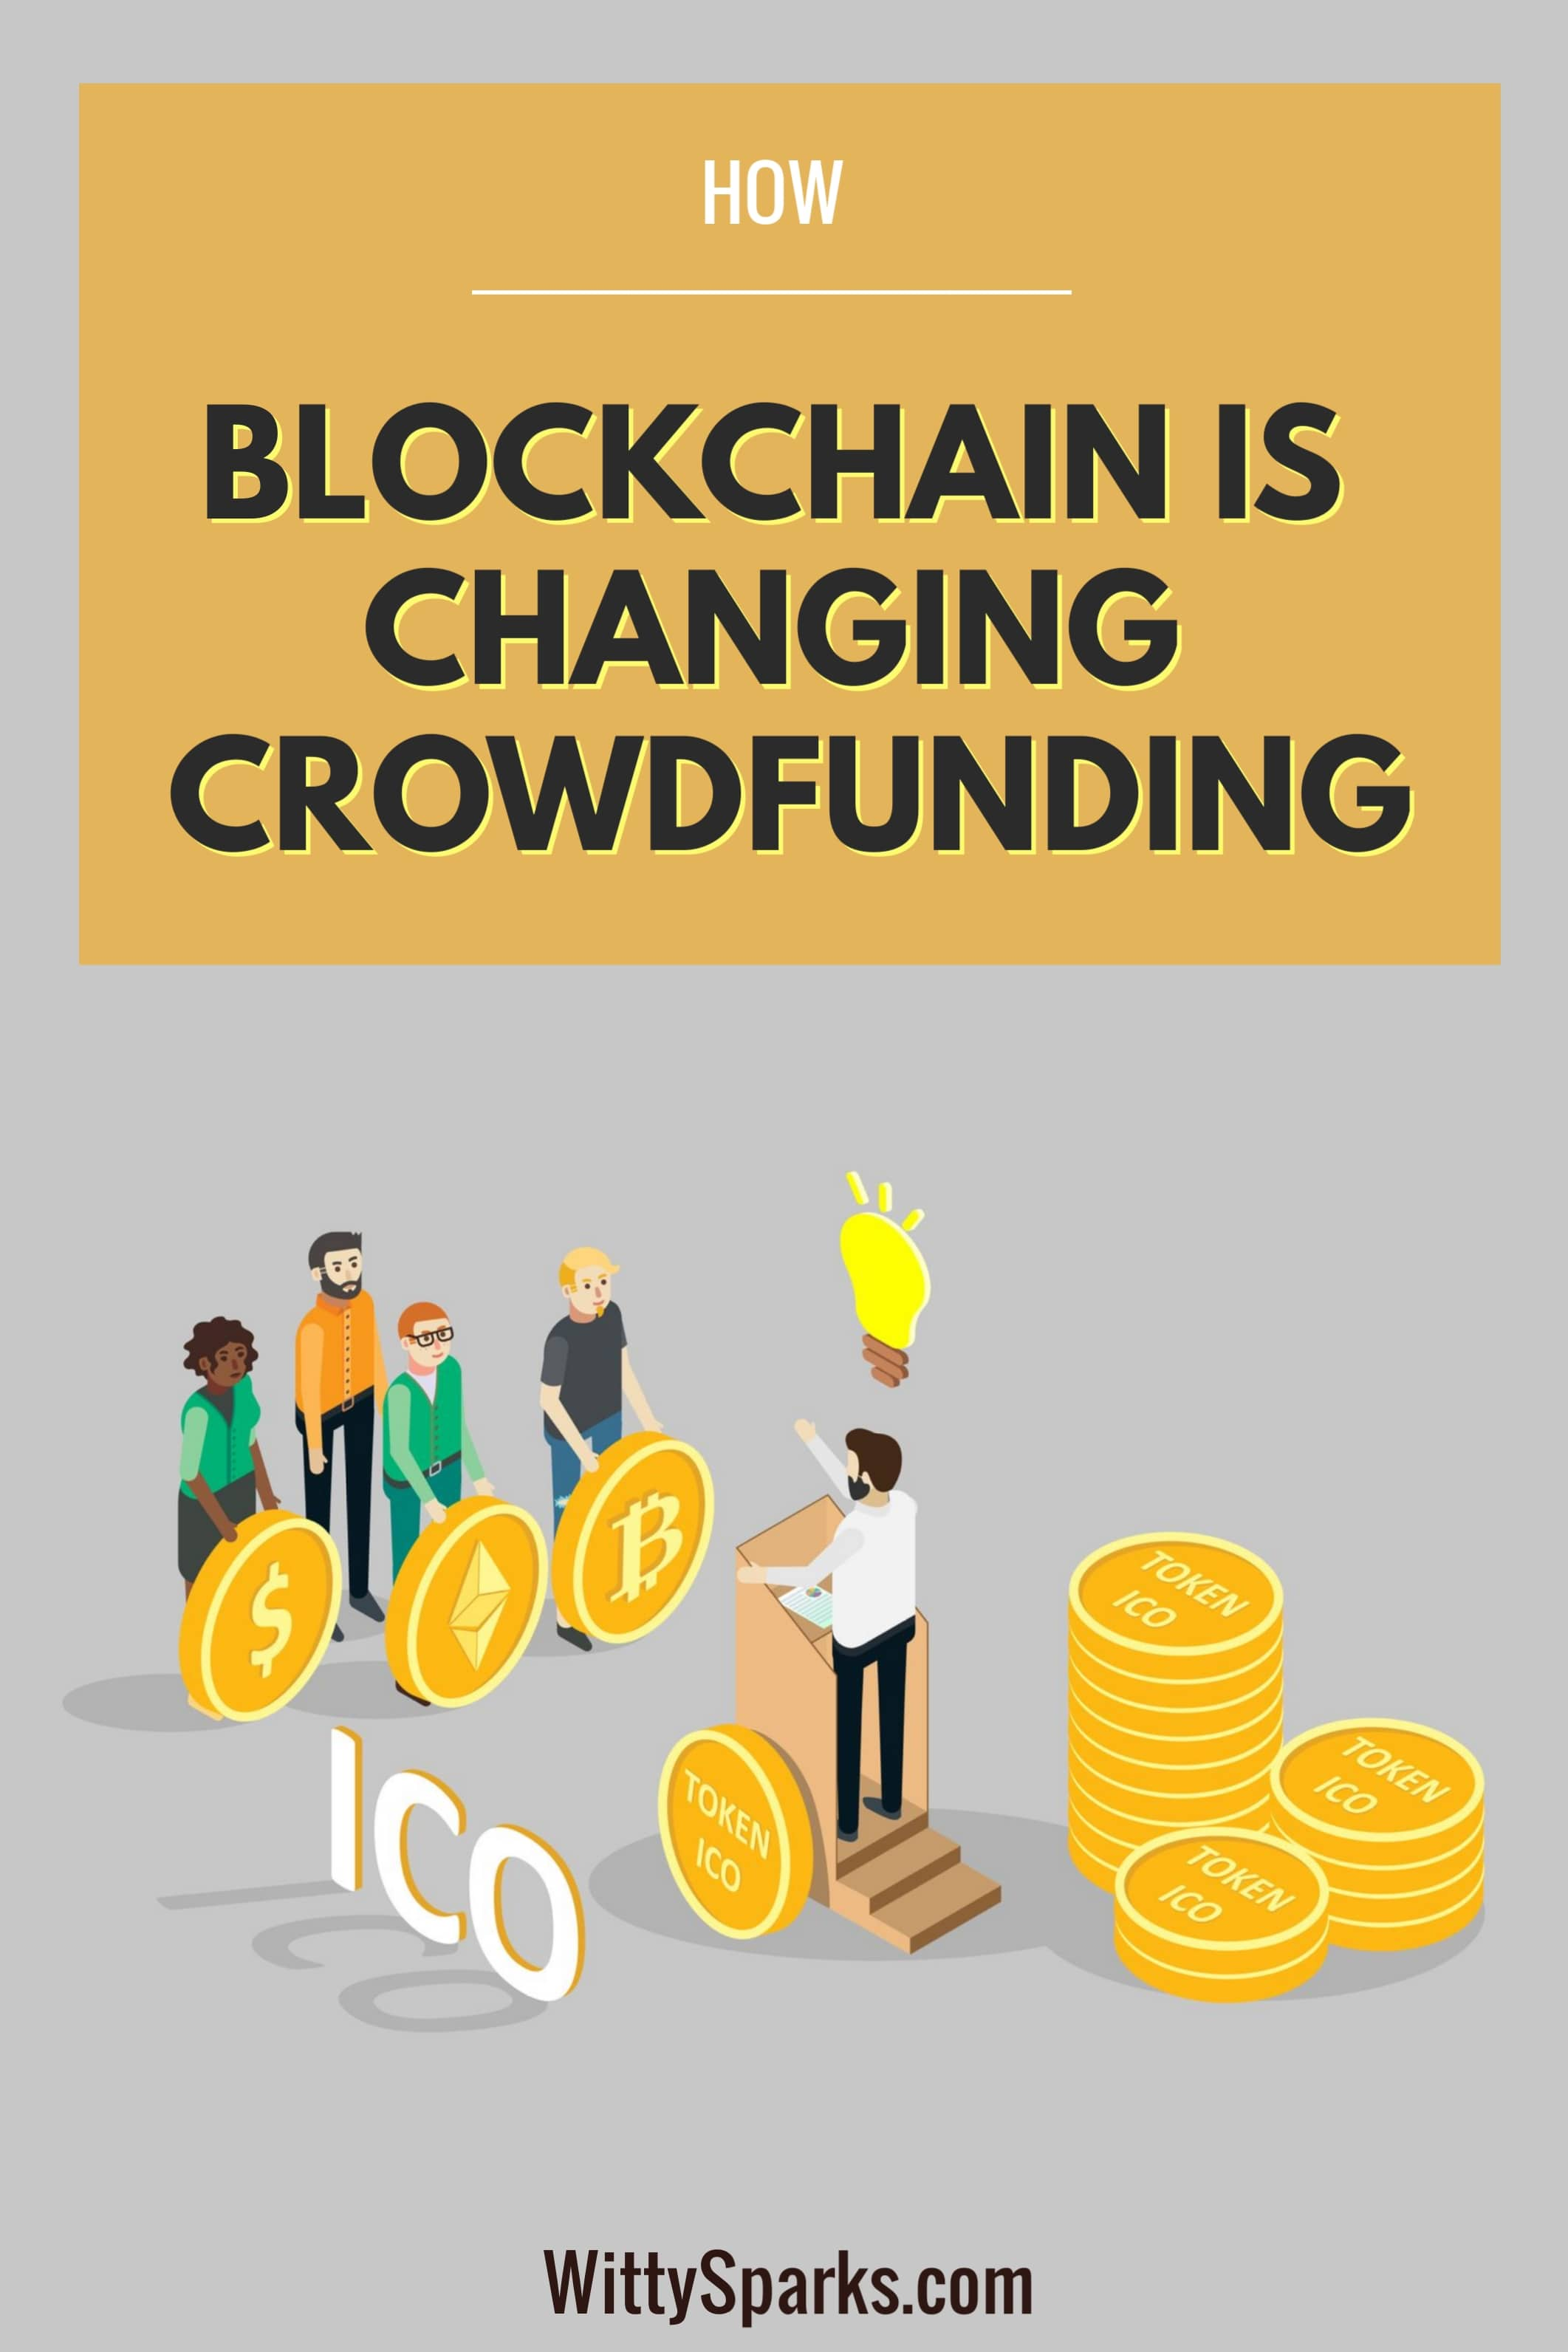 Blockchain-Based Crowdfunding